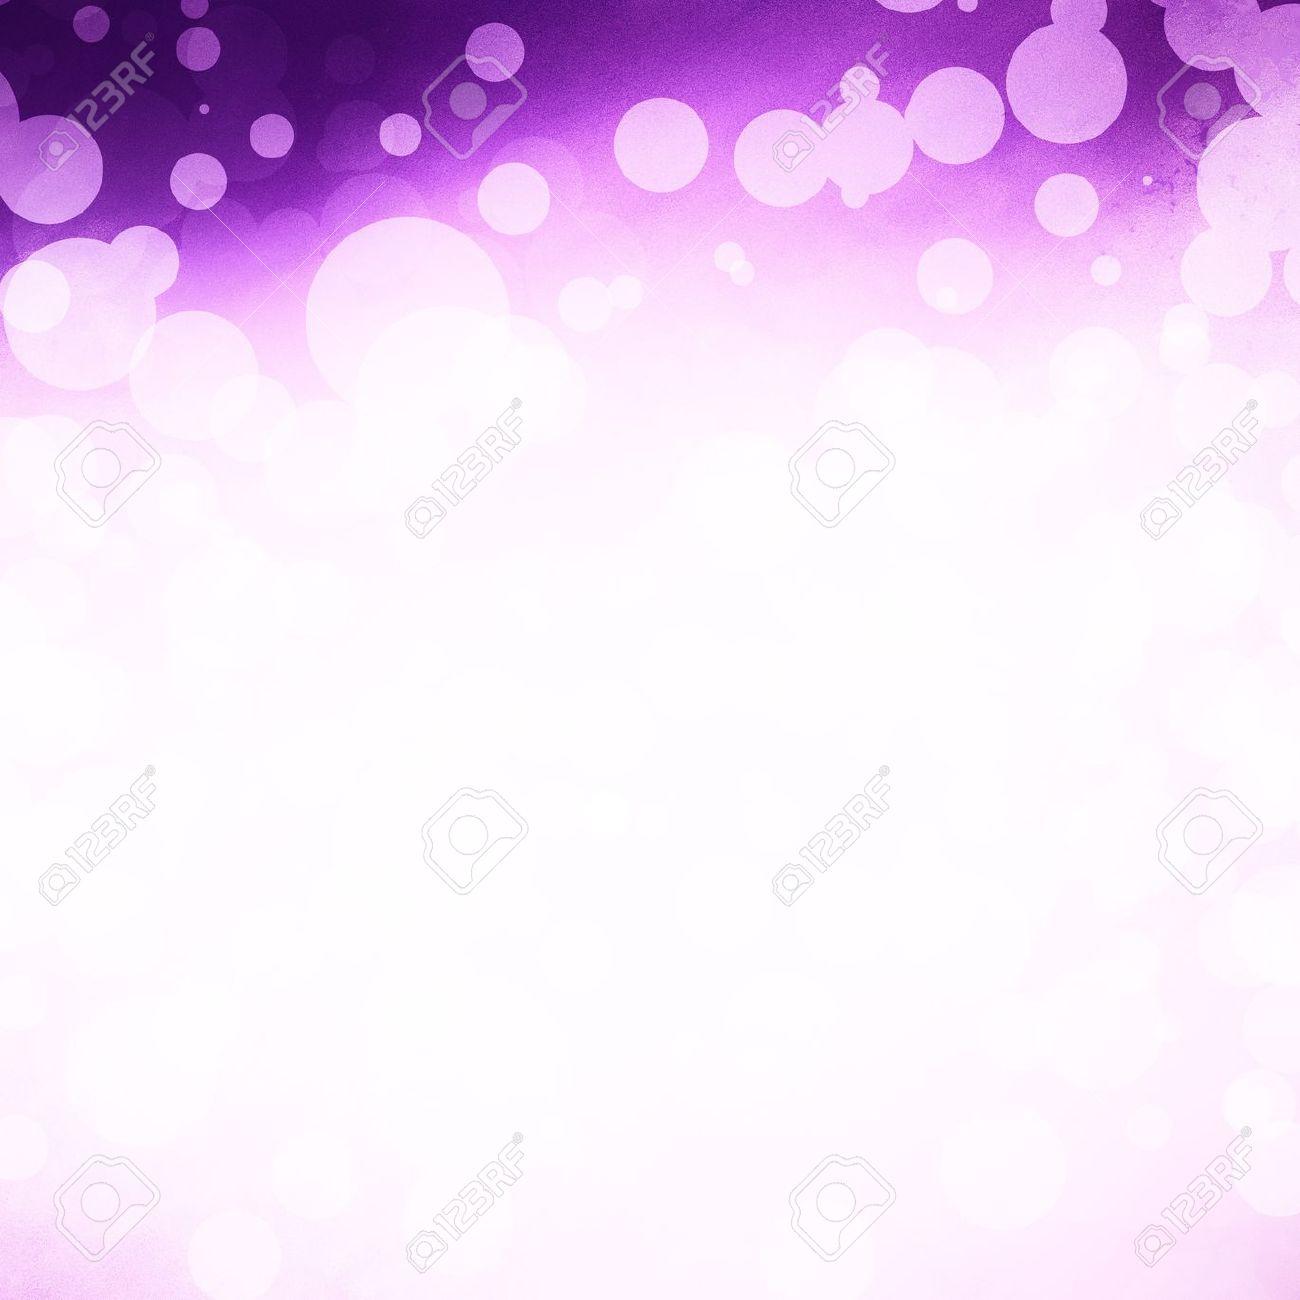 stock photo website design template background purple white lights for website header or sidebar abstract purple background white circle spots or dot